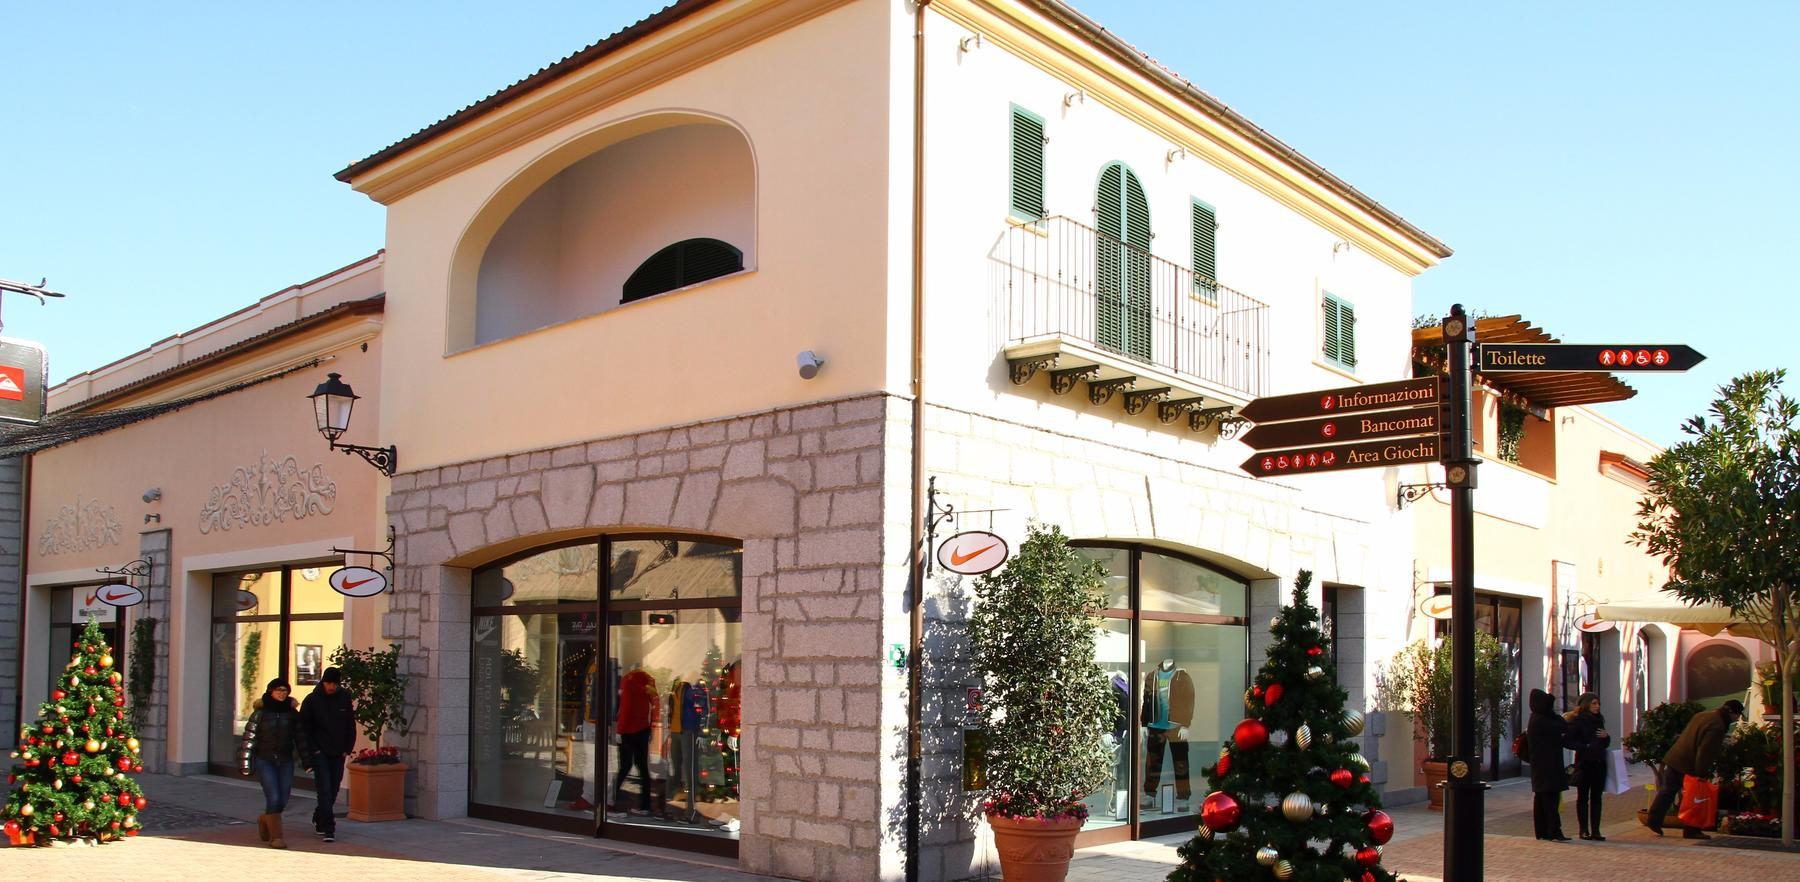 Nike Factory Store La Reggia - Marcianise